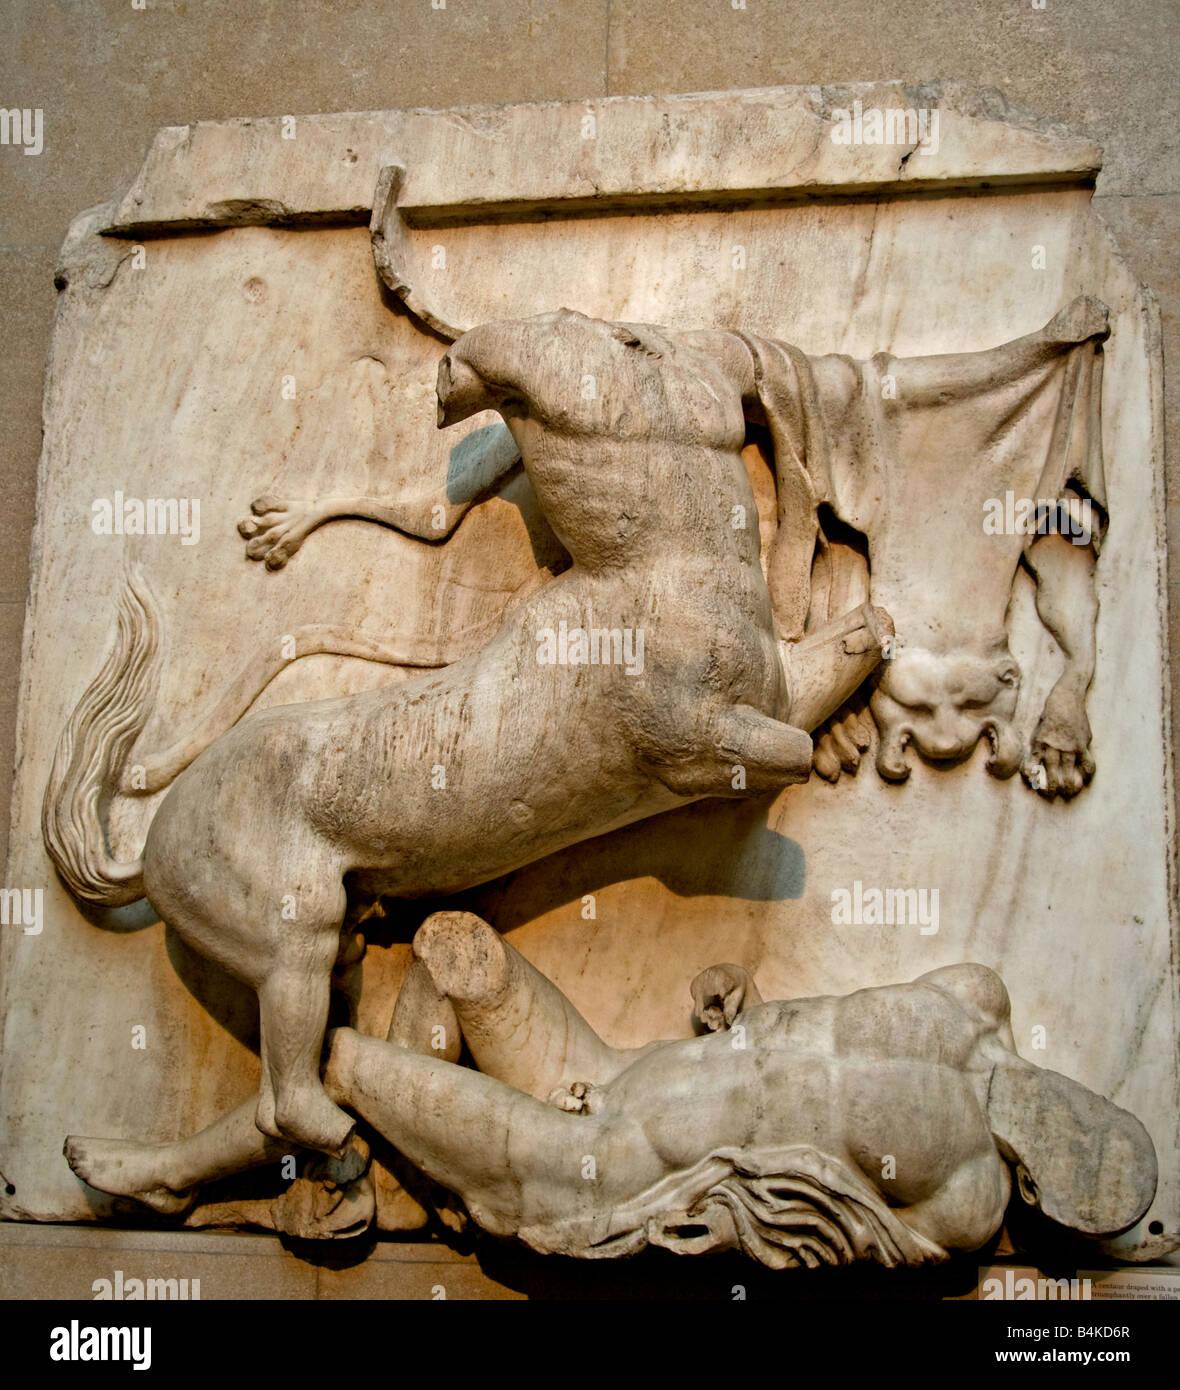 Centaur Panther skin Lapith Parthenon Pediment Metopes Frieze Greek mythology Greece Elgin Marbles Acropolis Athens Stock Photo